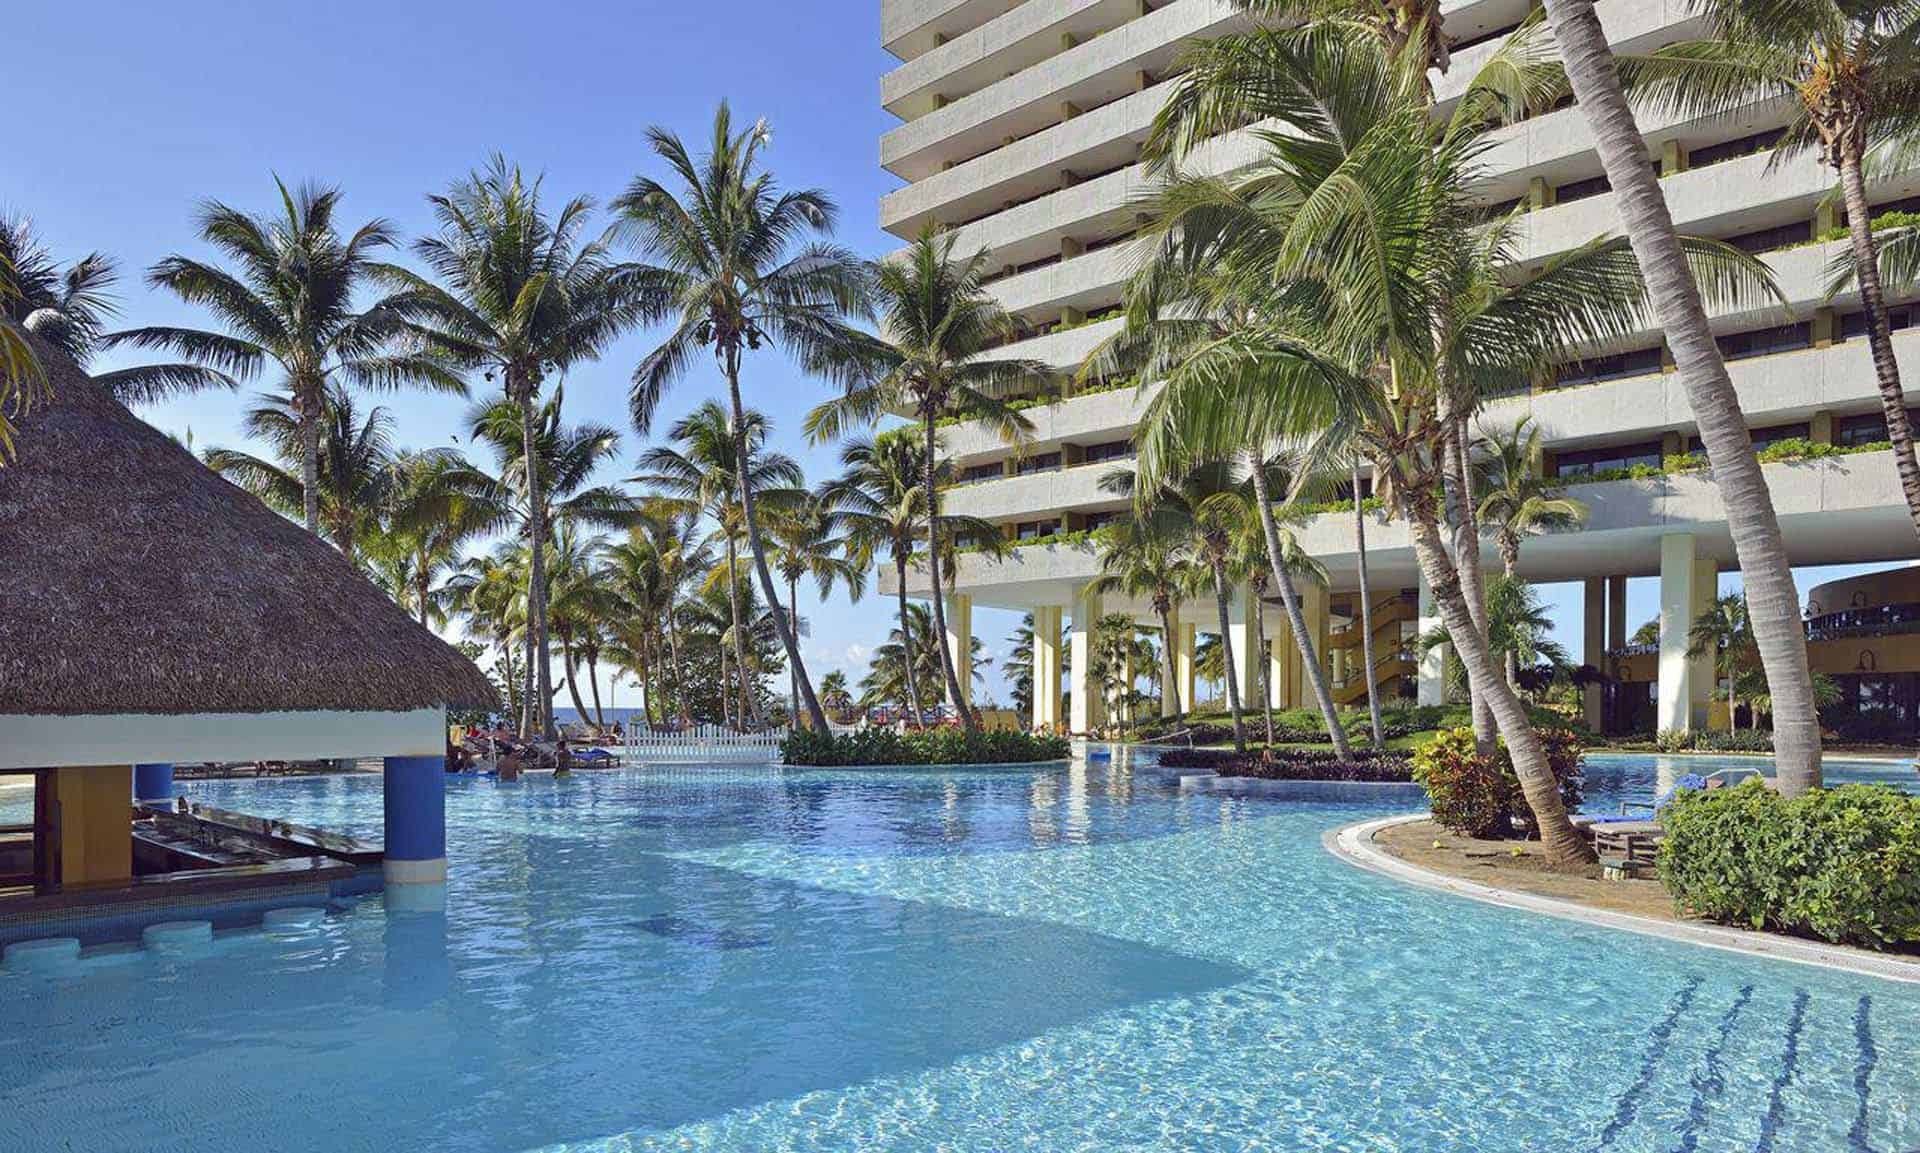 H1453 Piscine hotel Melia La Havane Cuba